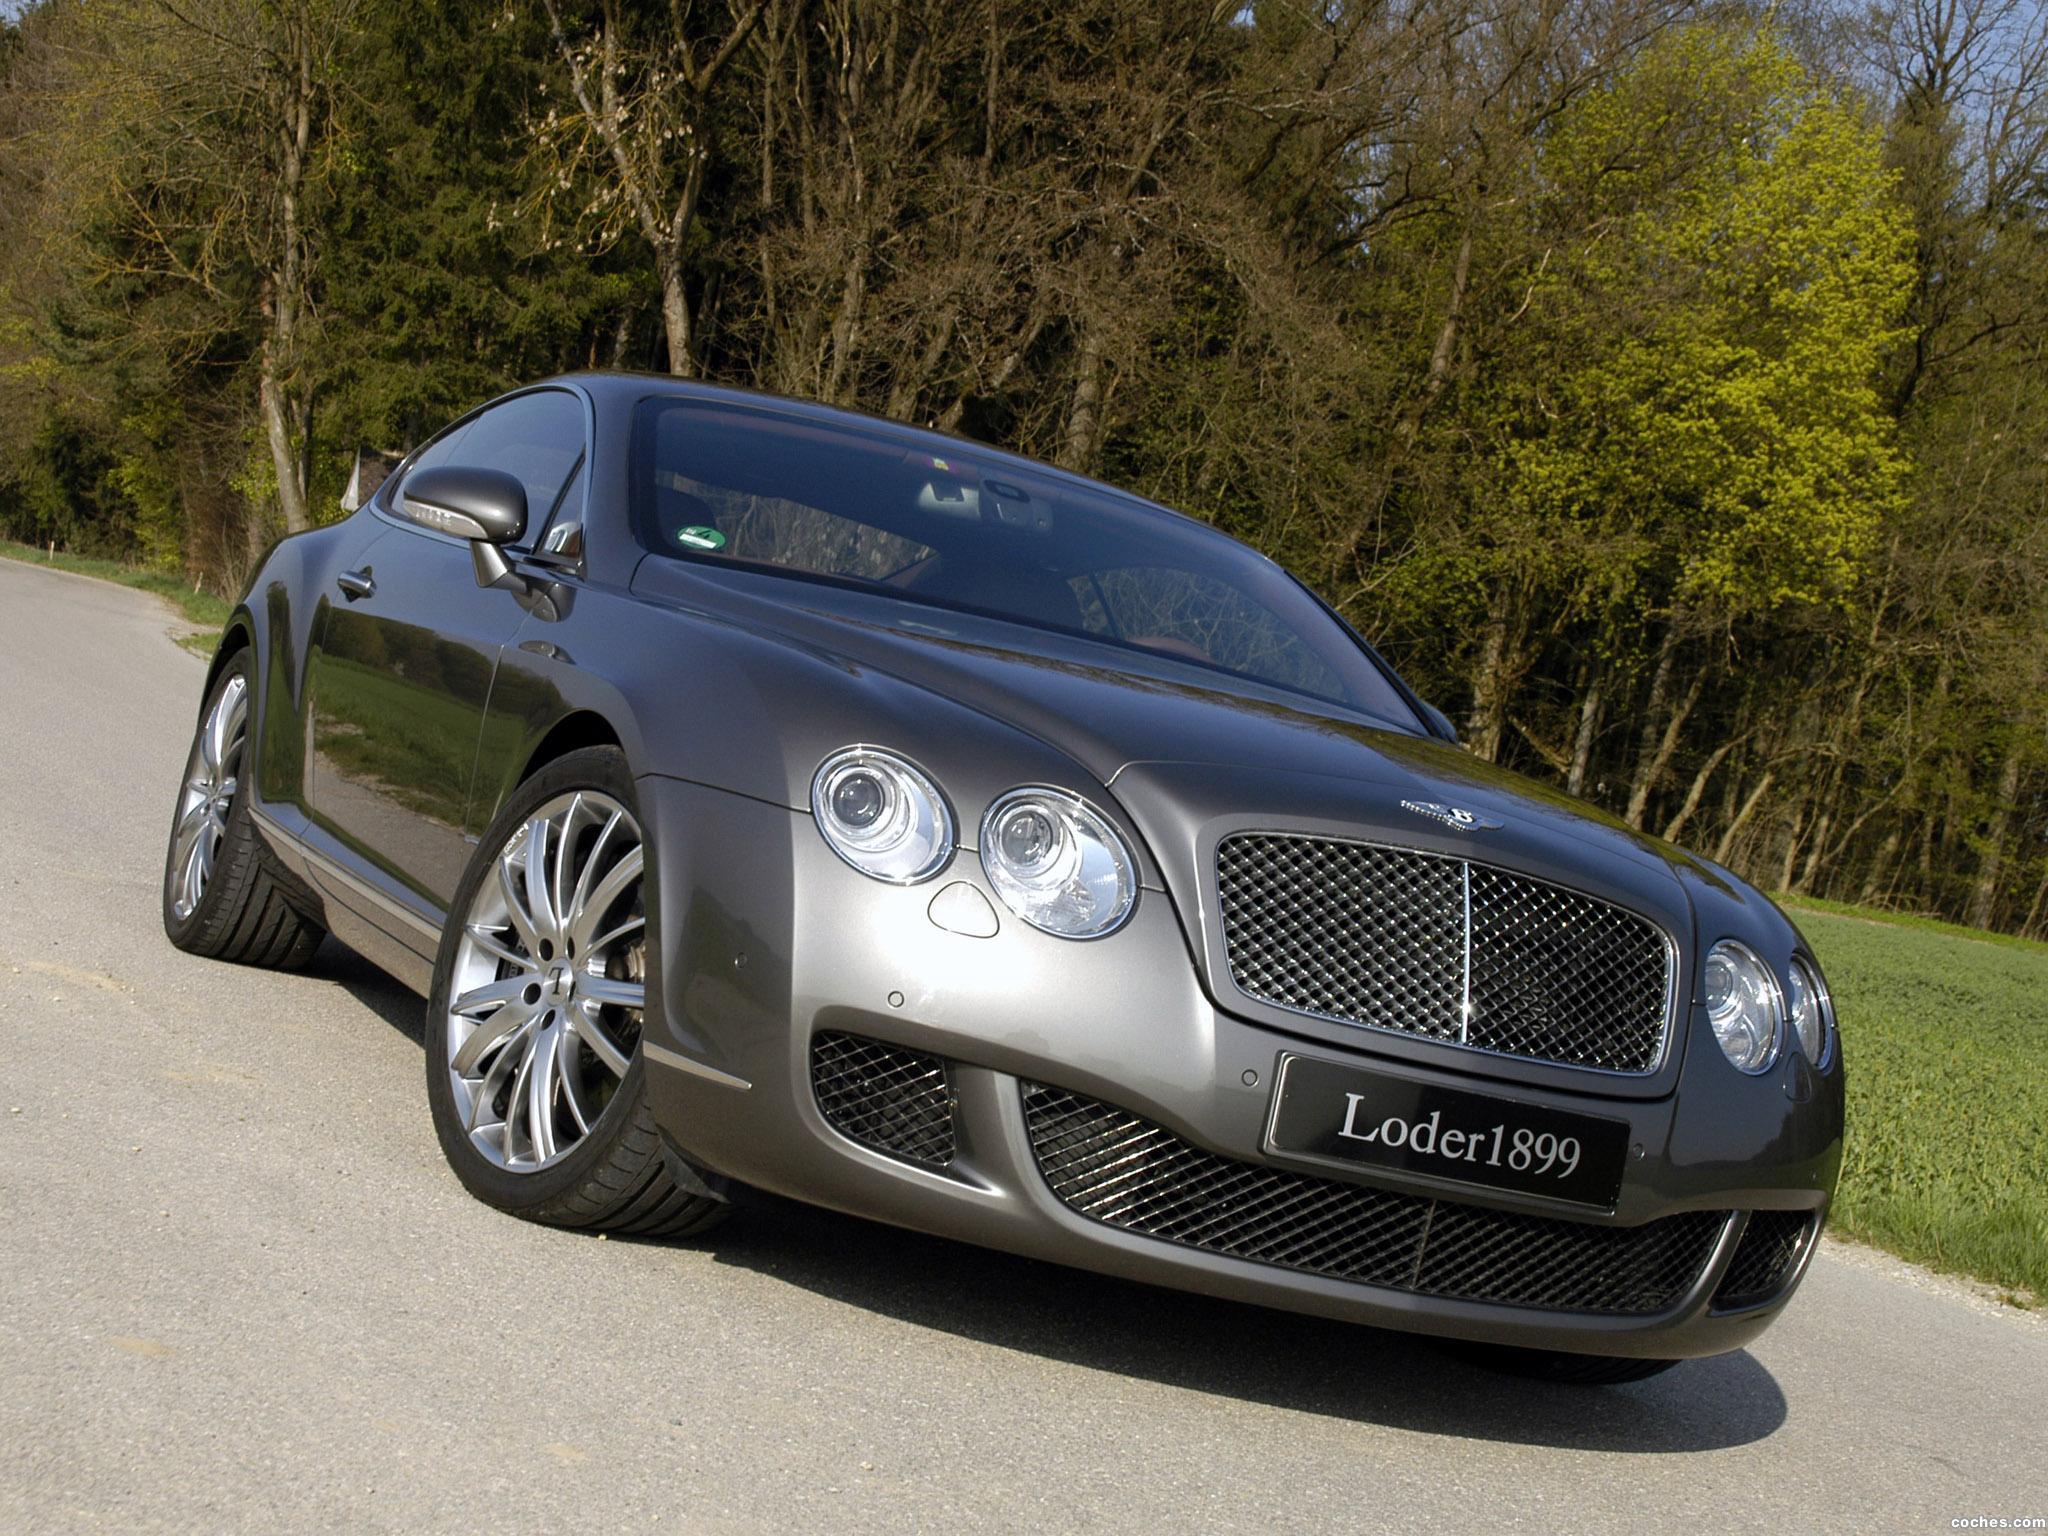 Foto 0 de Loder1899 Bentley Continental GT 2009